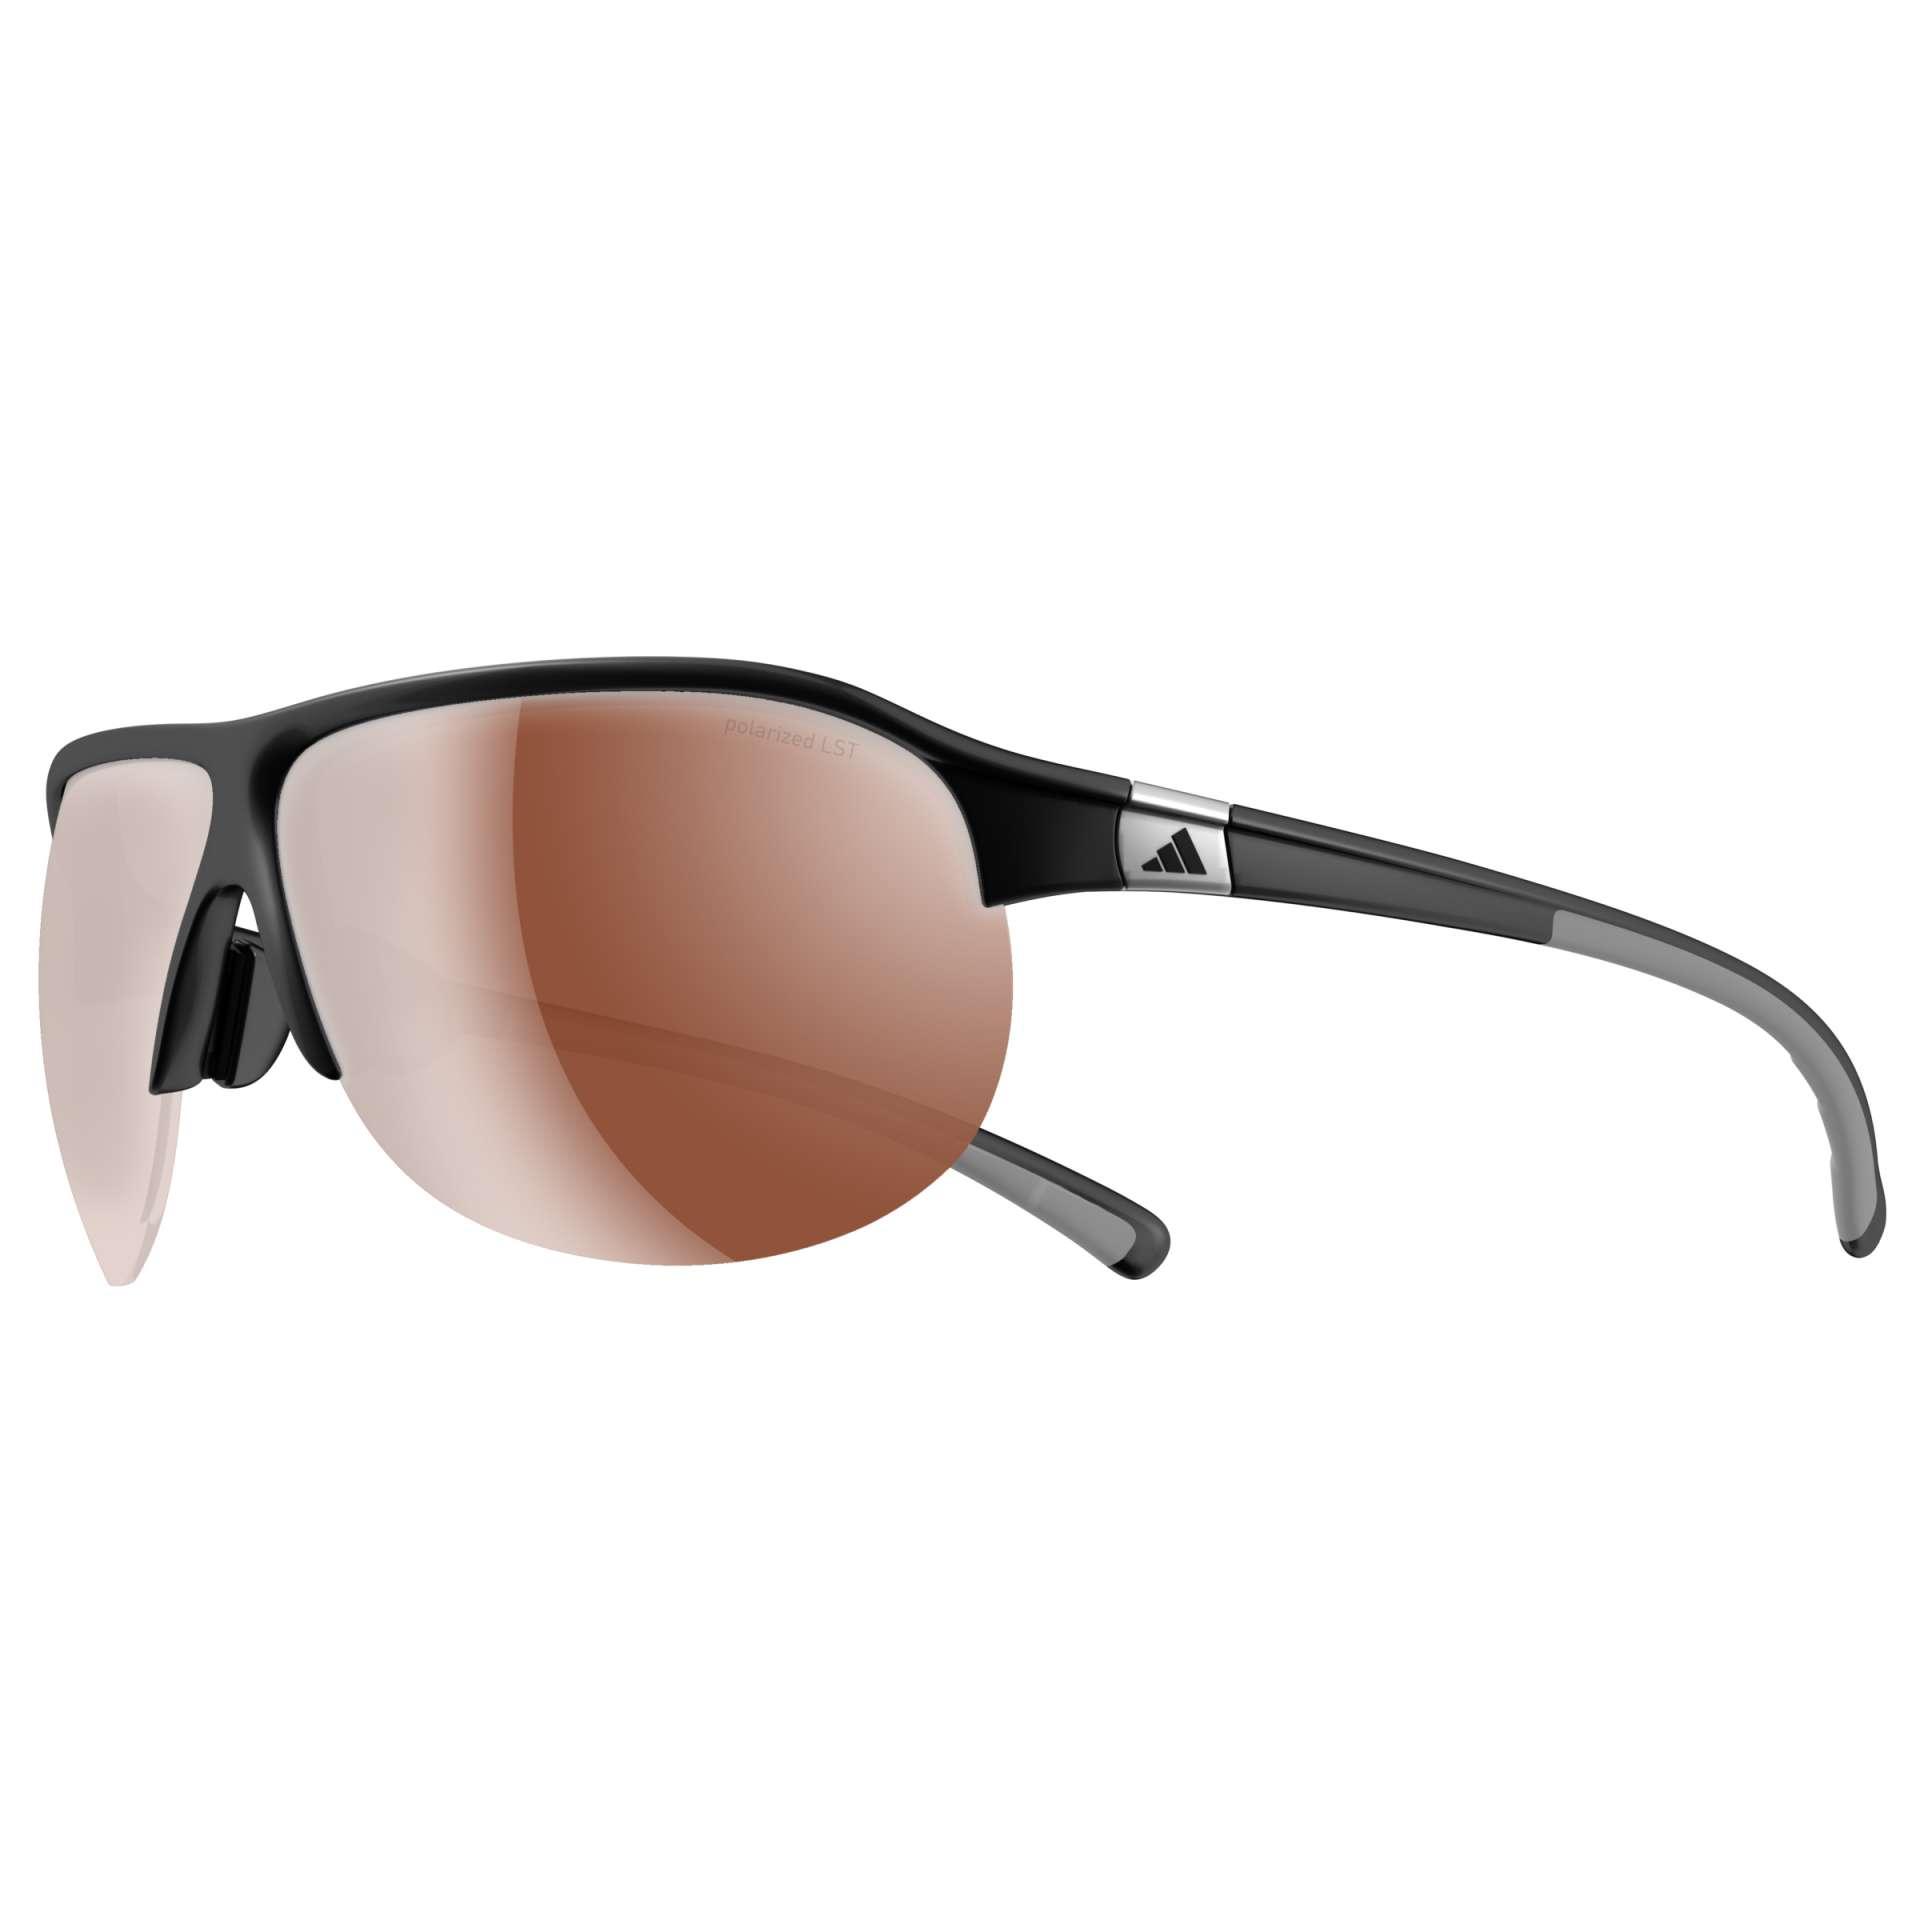 d4895e51f8c458 adidas Tourpro L Sportbril Mat Zwart Grijs koop je bij Futurumshop.nl